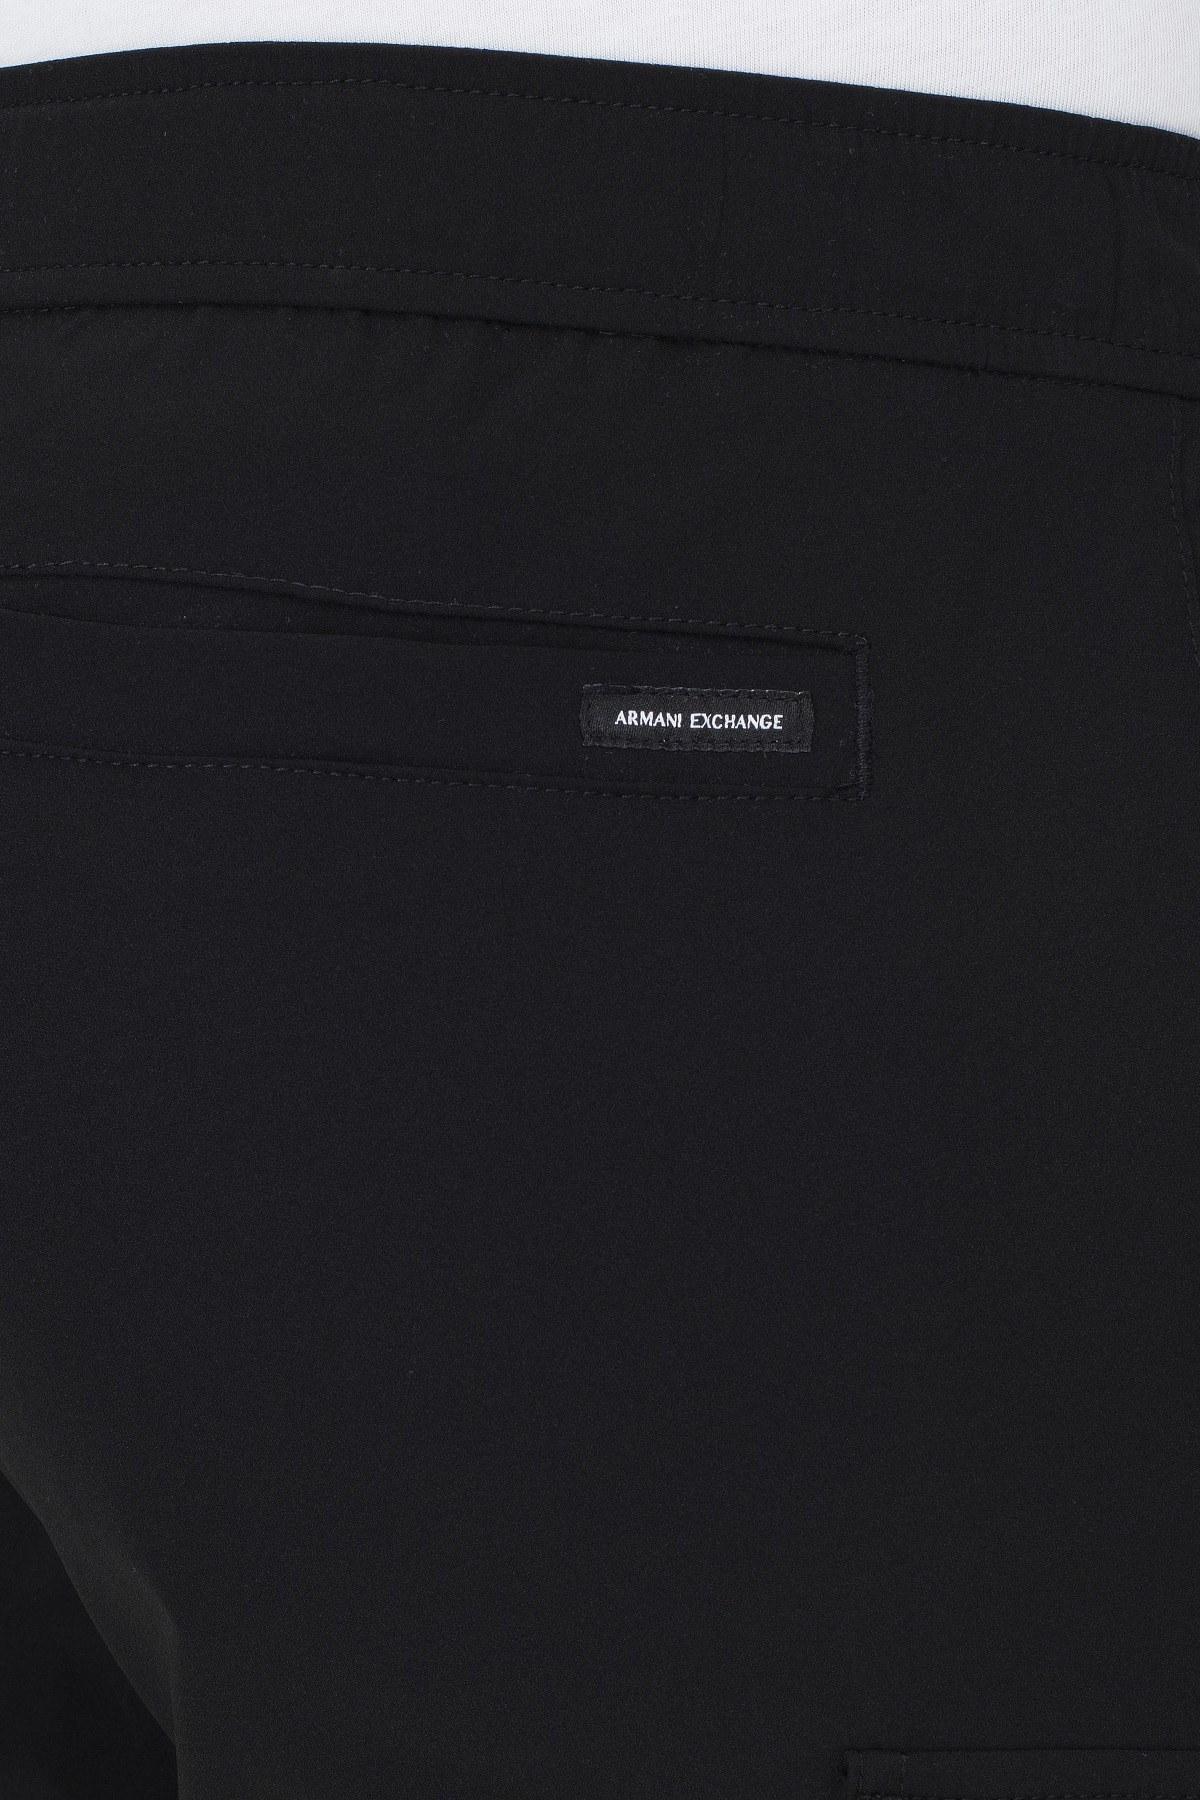 Armani Exchange Kemerli Paçası Lastikli Bol Kesim Erkek Pantolon 3HZP18 ZNHQZ 1200 SİYAH